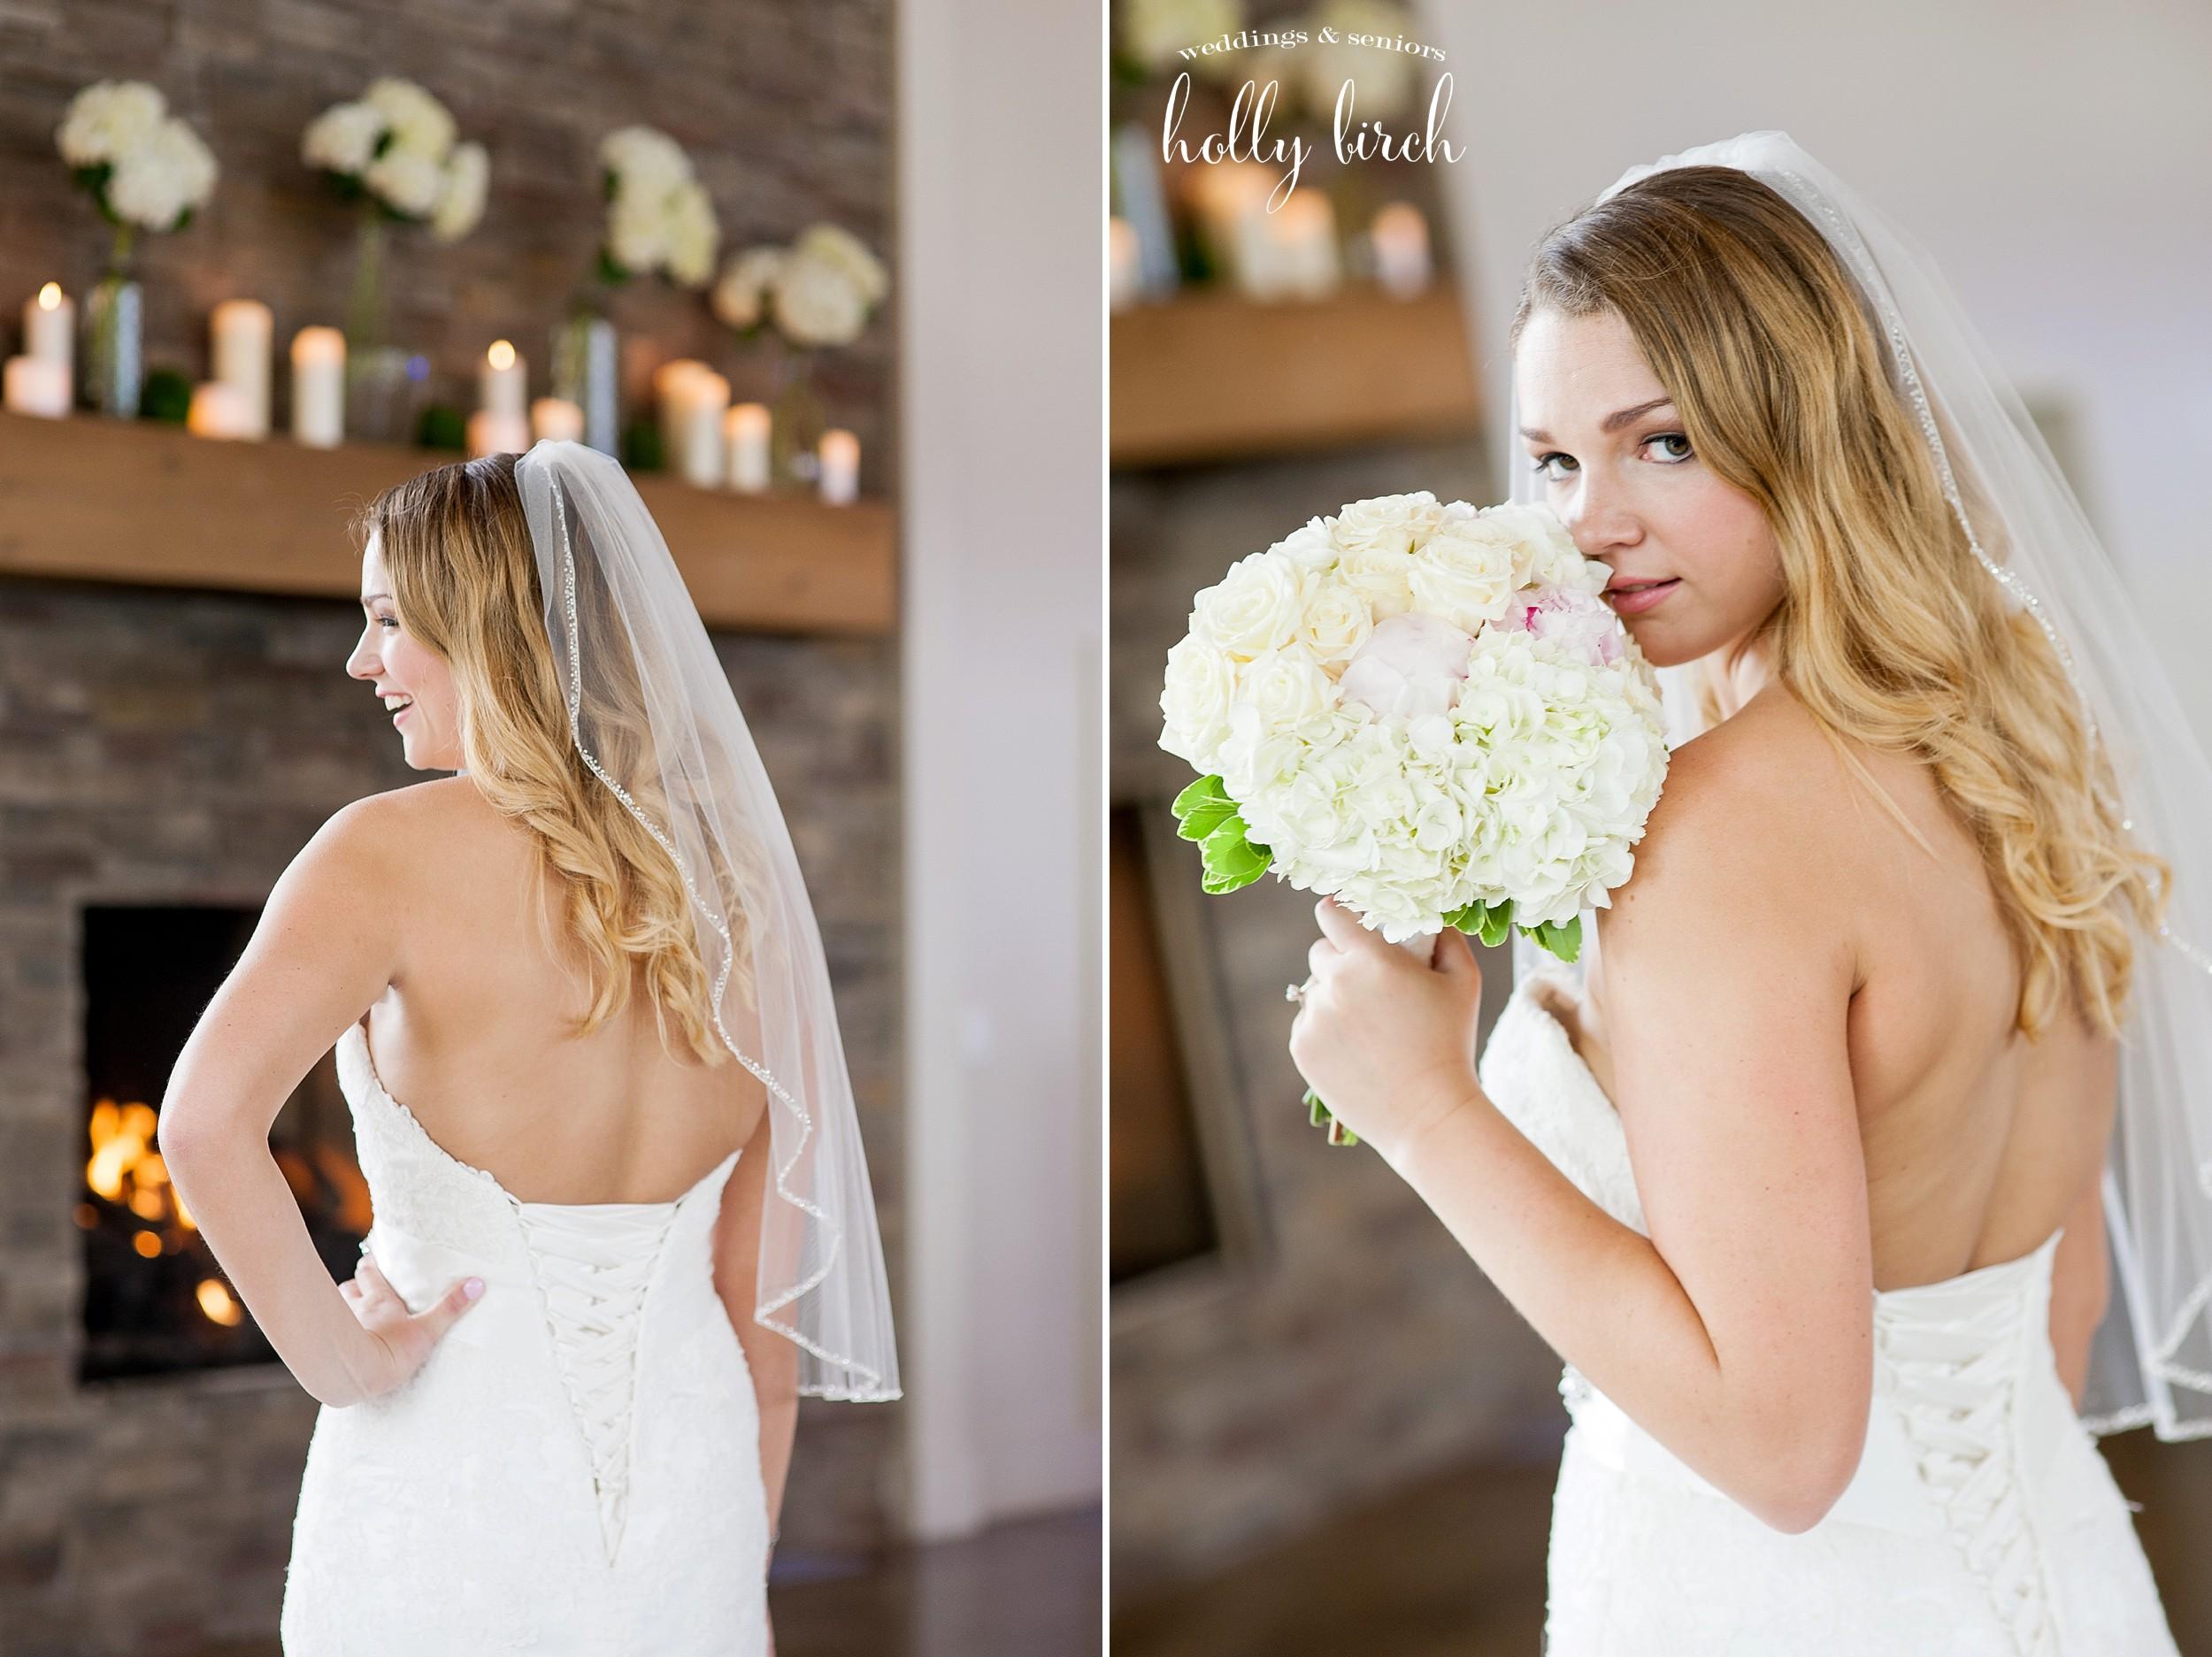 stunning bride photos